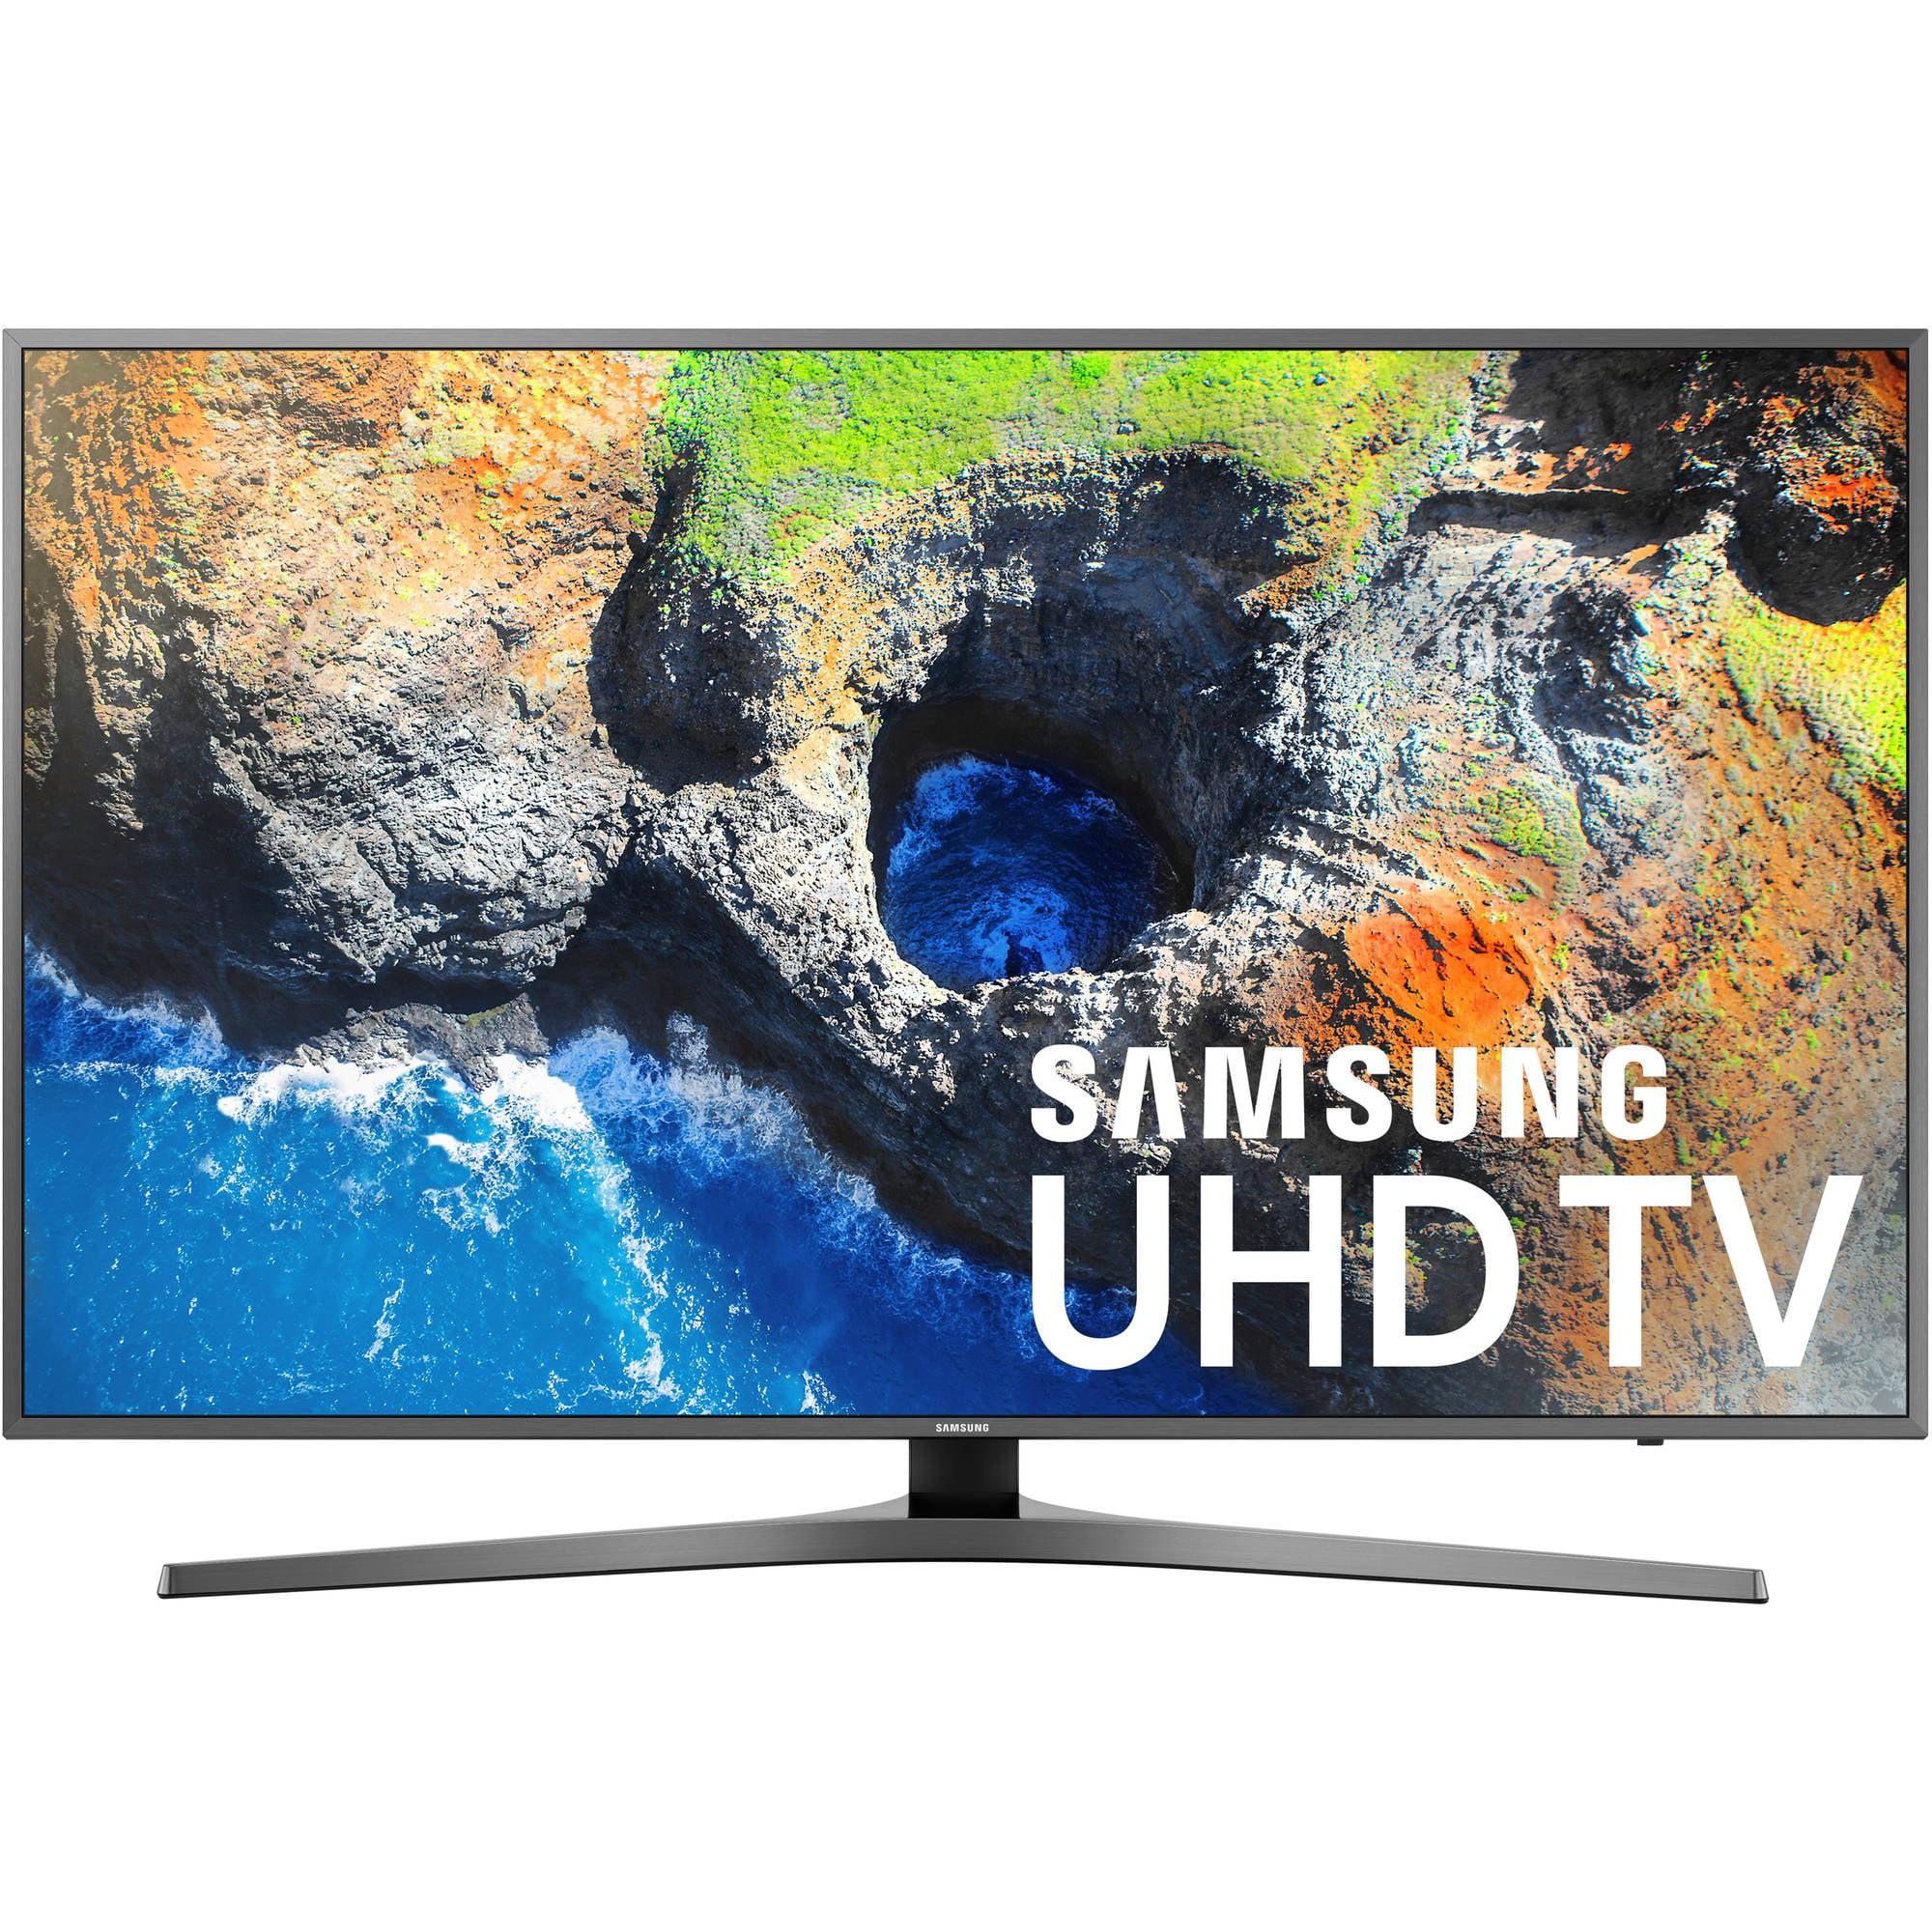 "Click here to buy Samsung 55"" Class 4K (2160P) Smart LED TV (UN55MU7000) by Samsung."